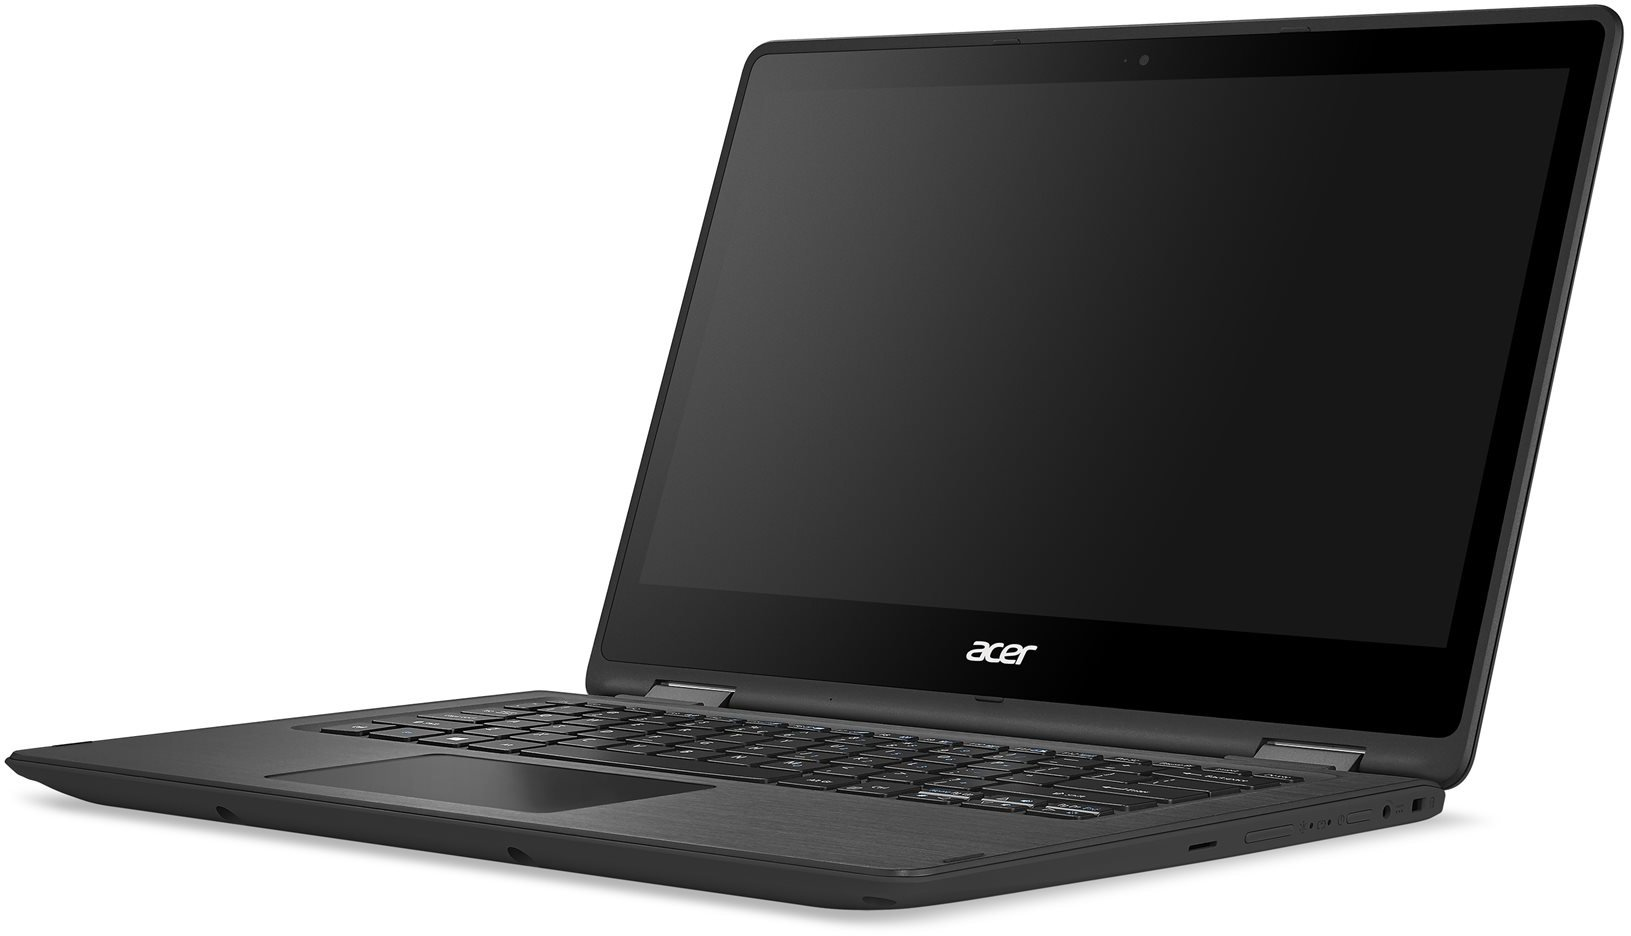 Acer Spin 5 SP513-51-552G